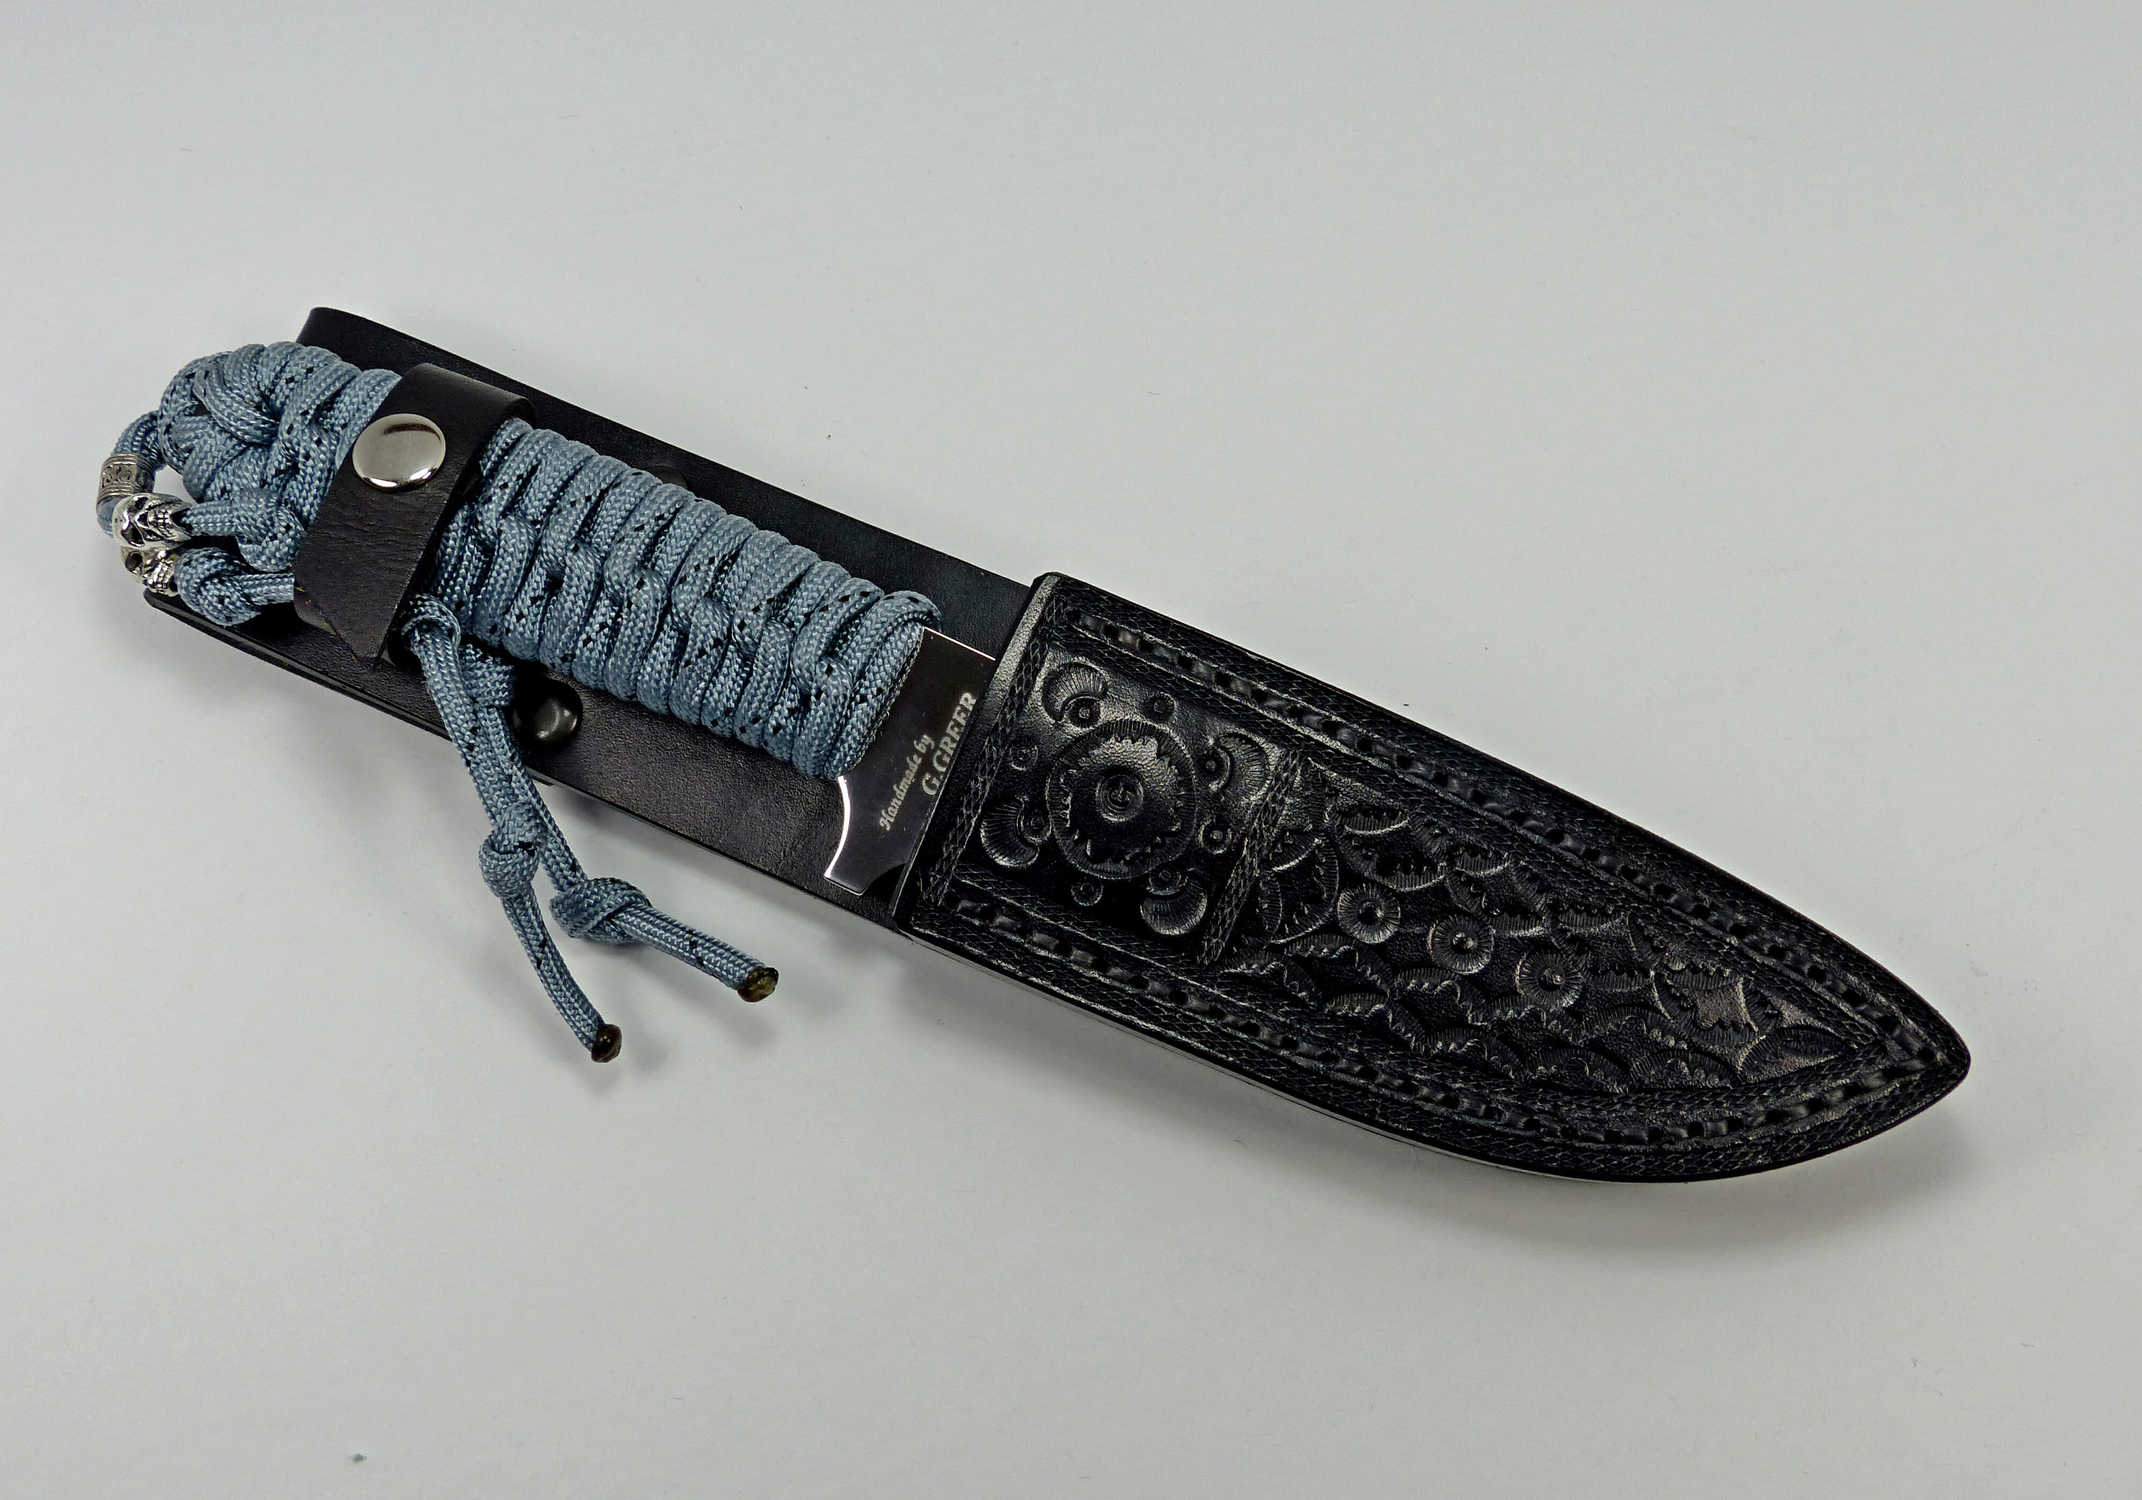 P-2 Titanium colored paracord utility knife inside custom fitted leather sheath